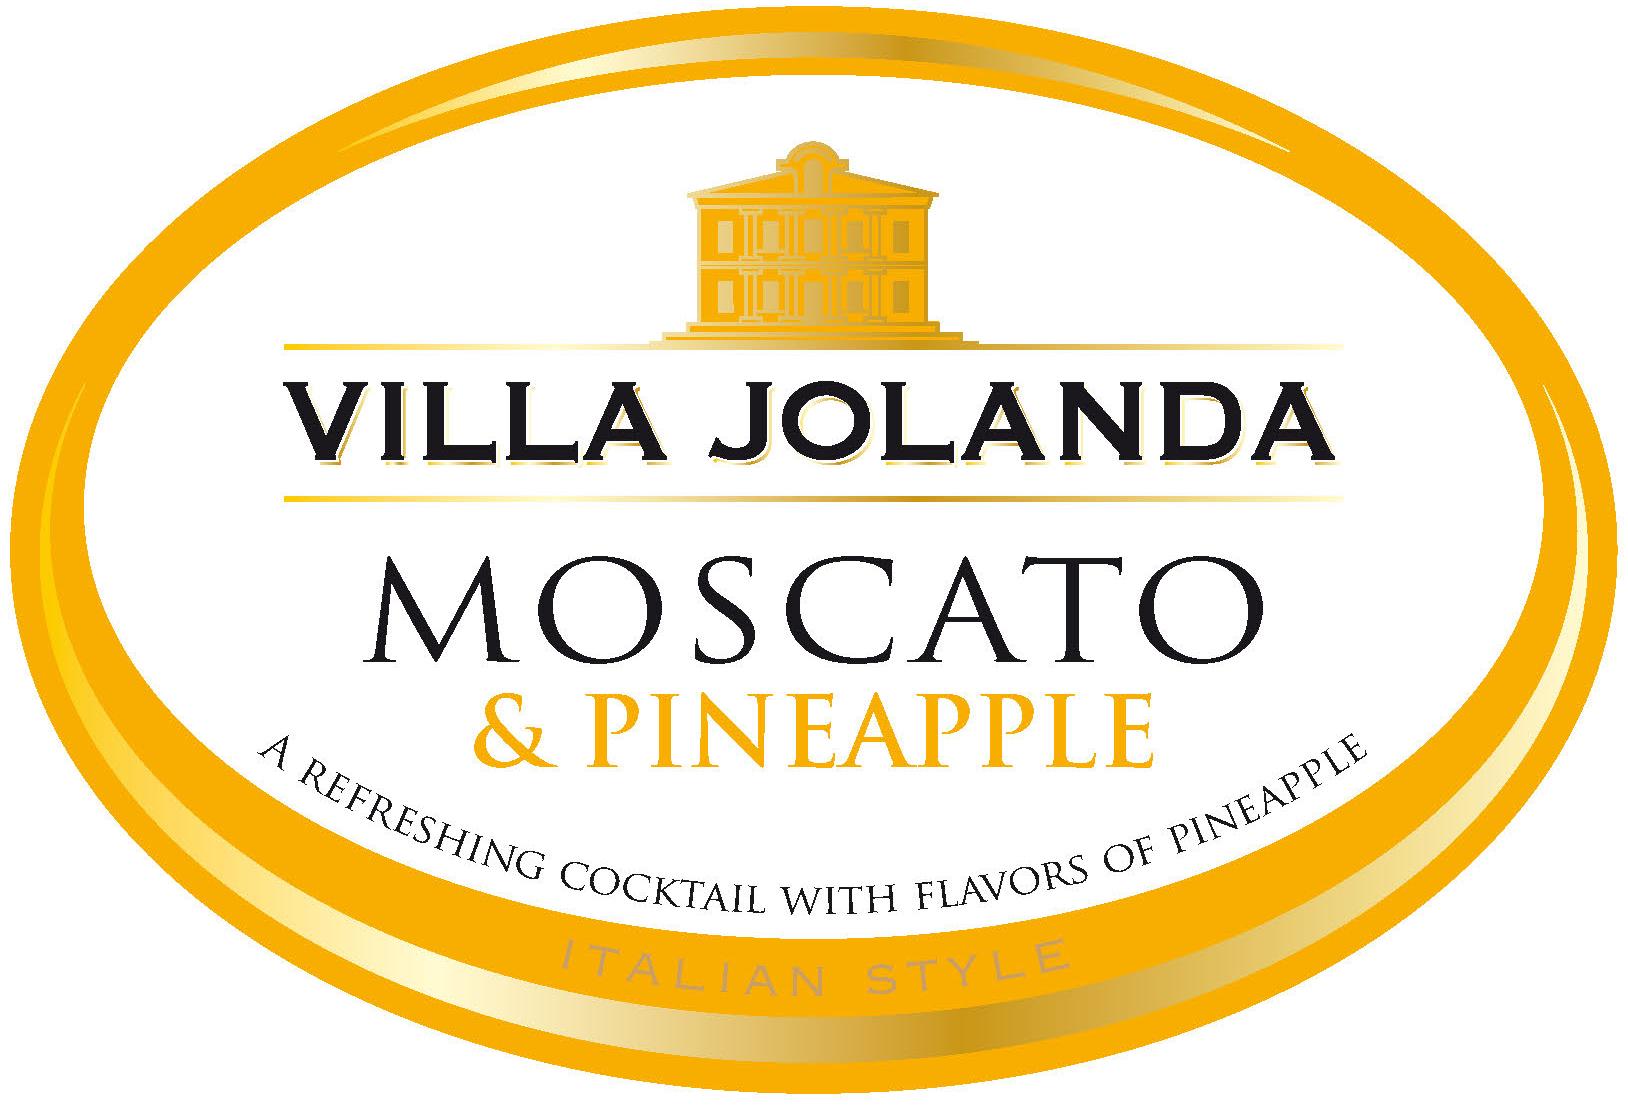 Villa Jolanda - Moscato and Pineapple